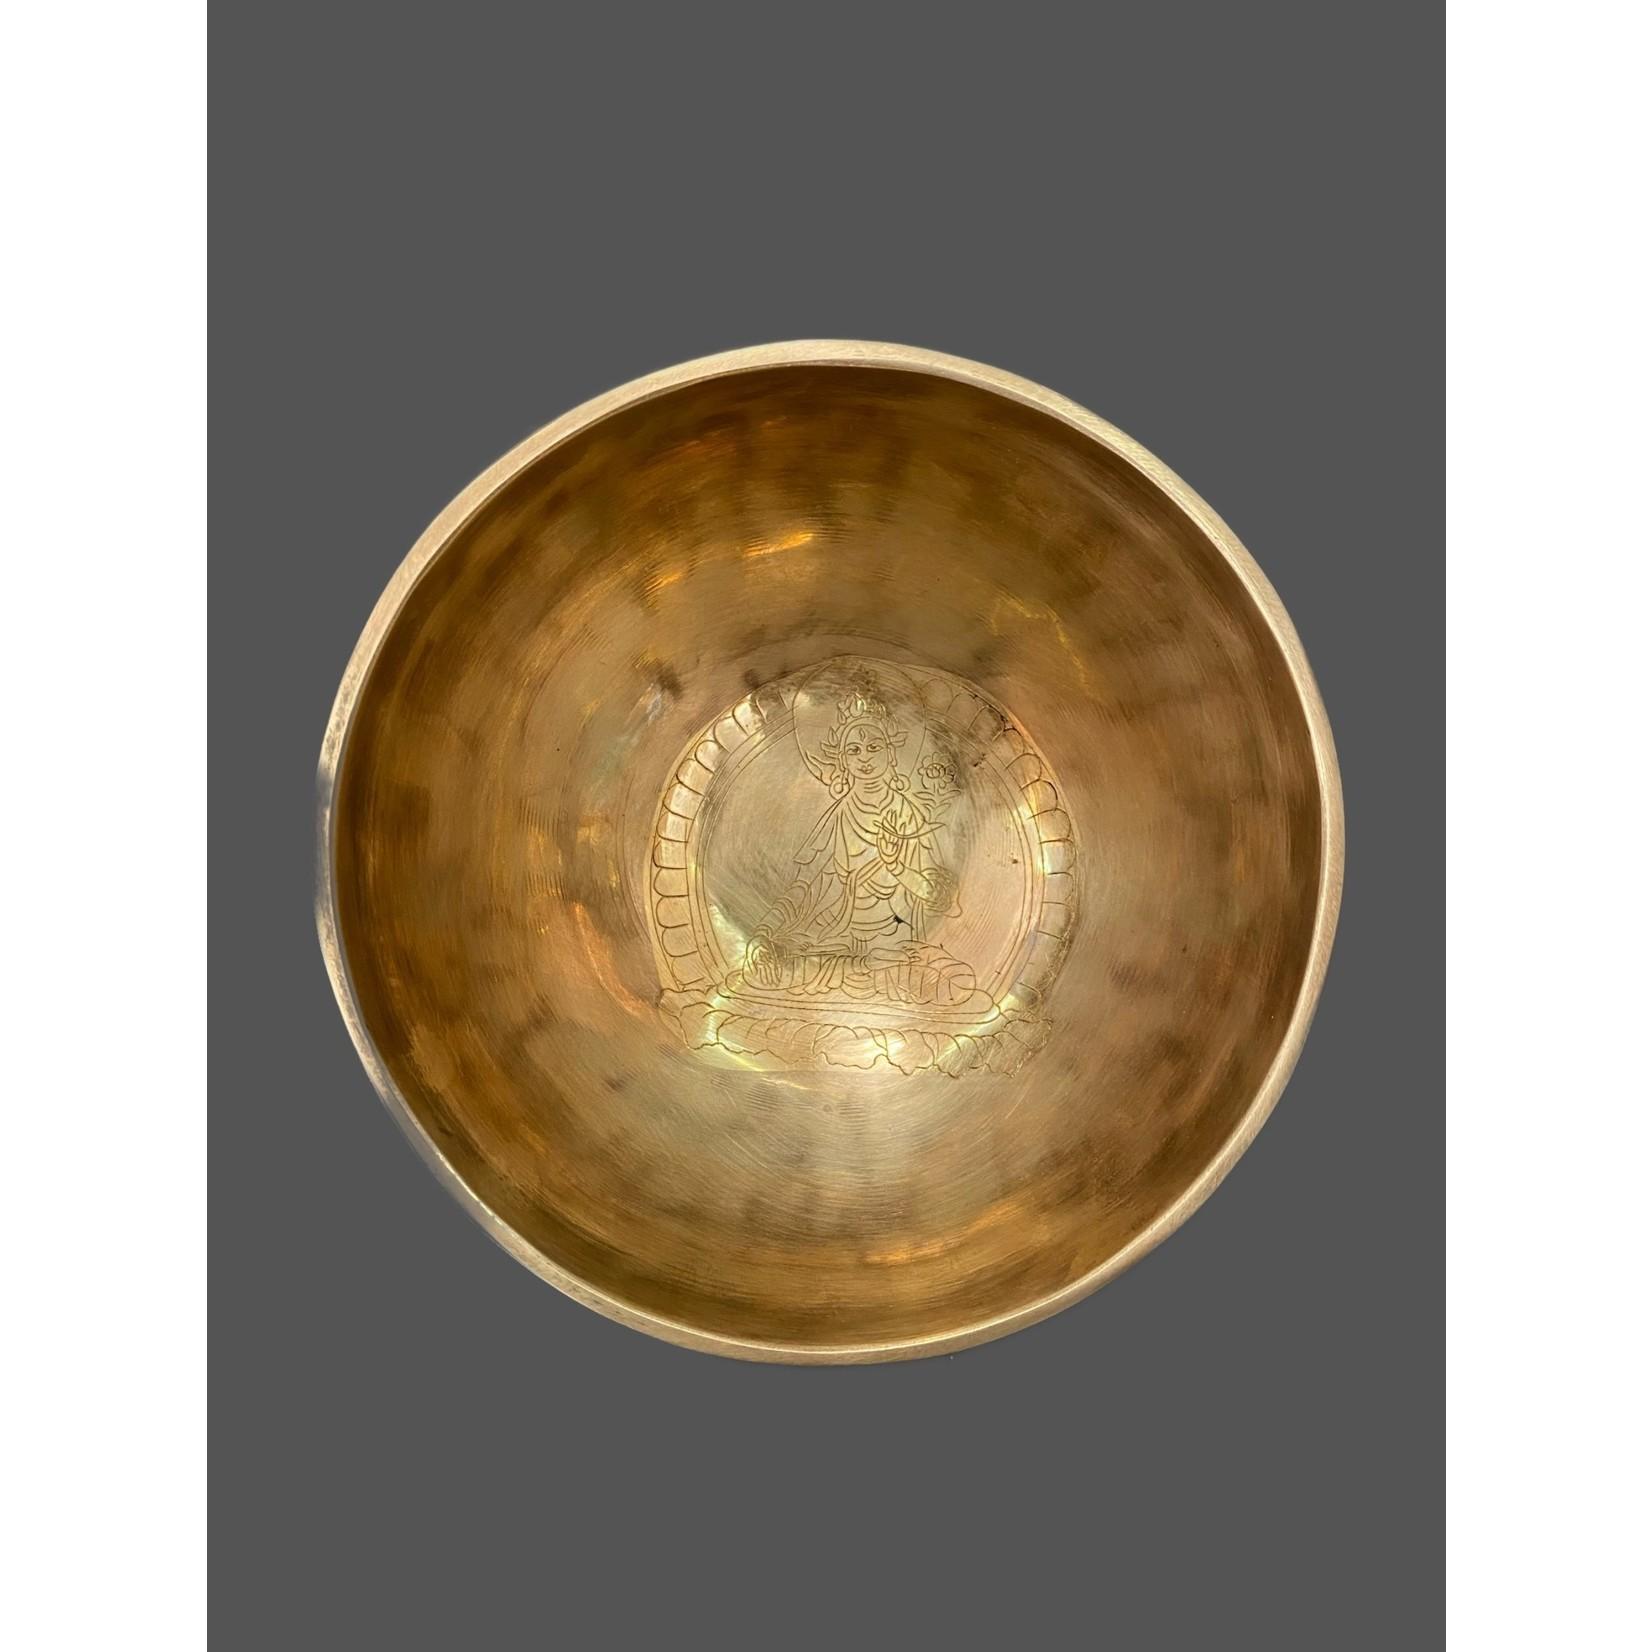 Cuenco tibetano Buda Tara blanca 400-600g; 13 cm